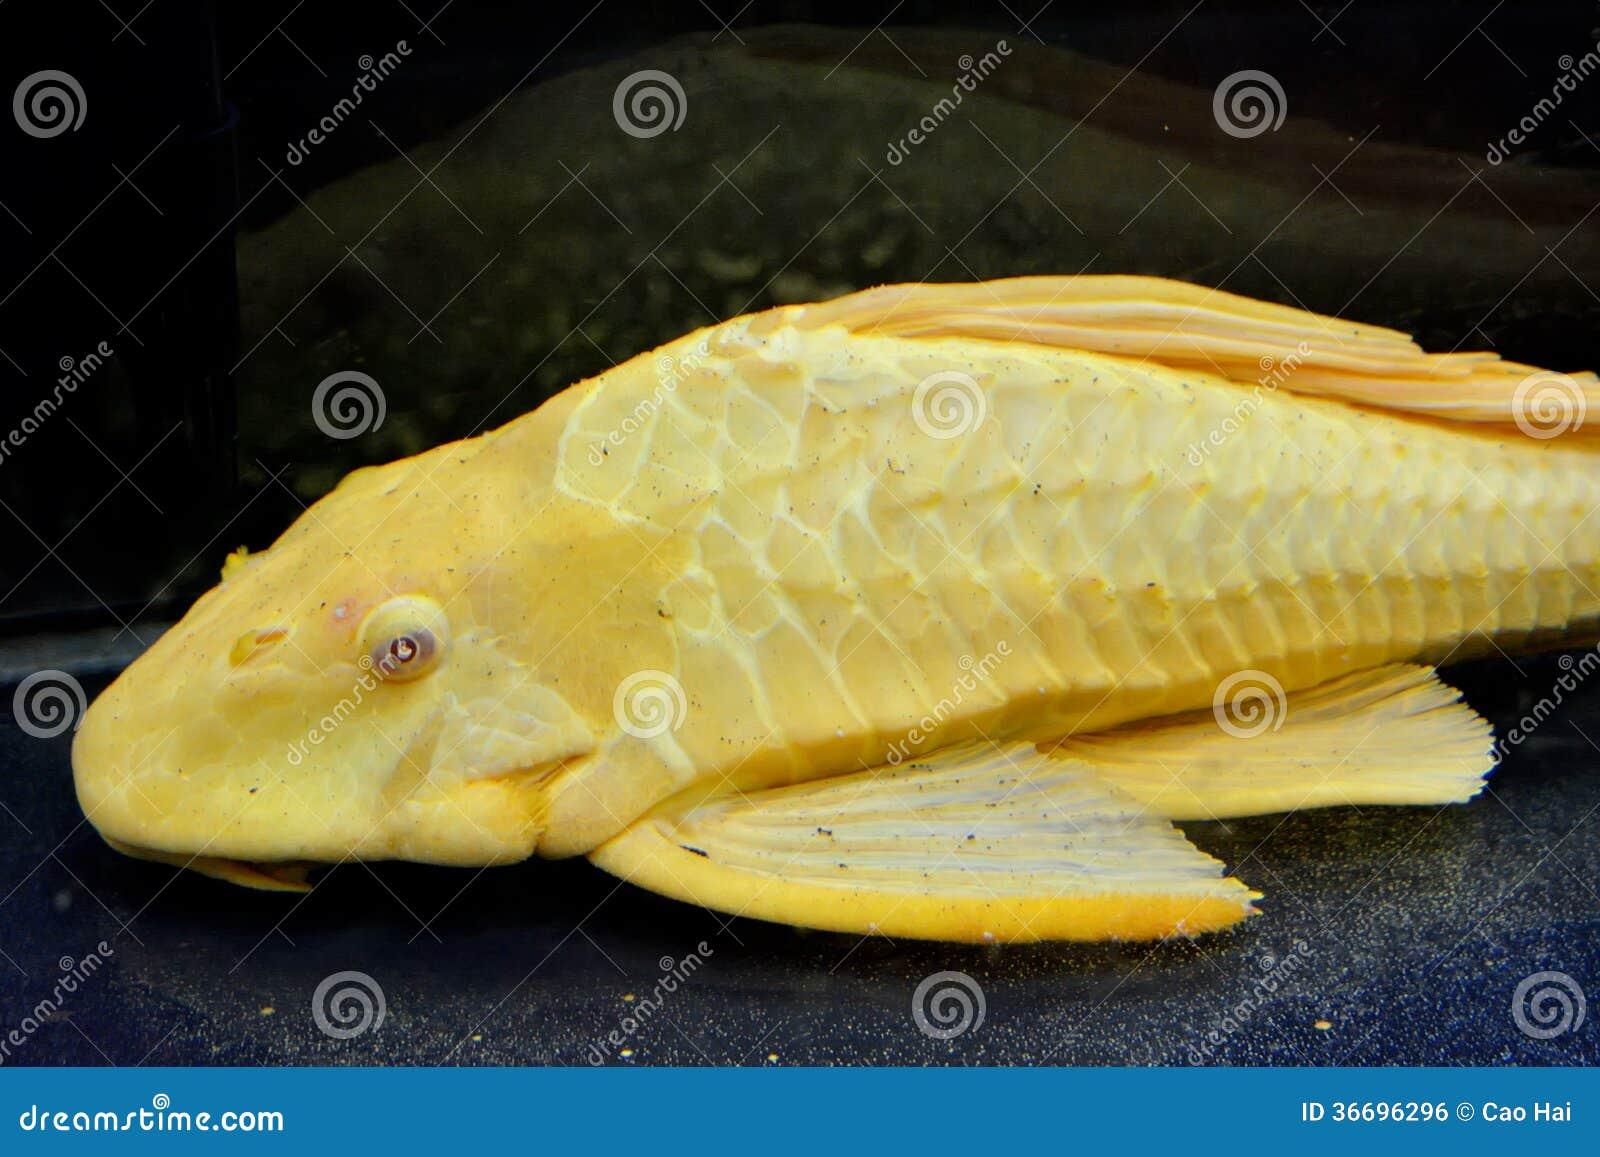 A yellow aquarium fish royalty free stock image image for Yellow fish tank water